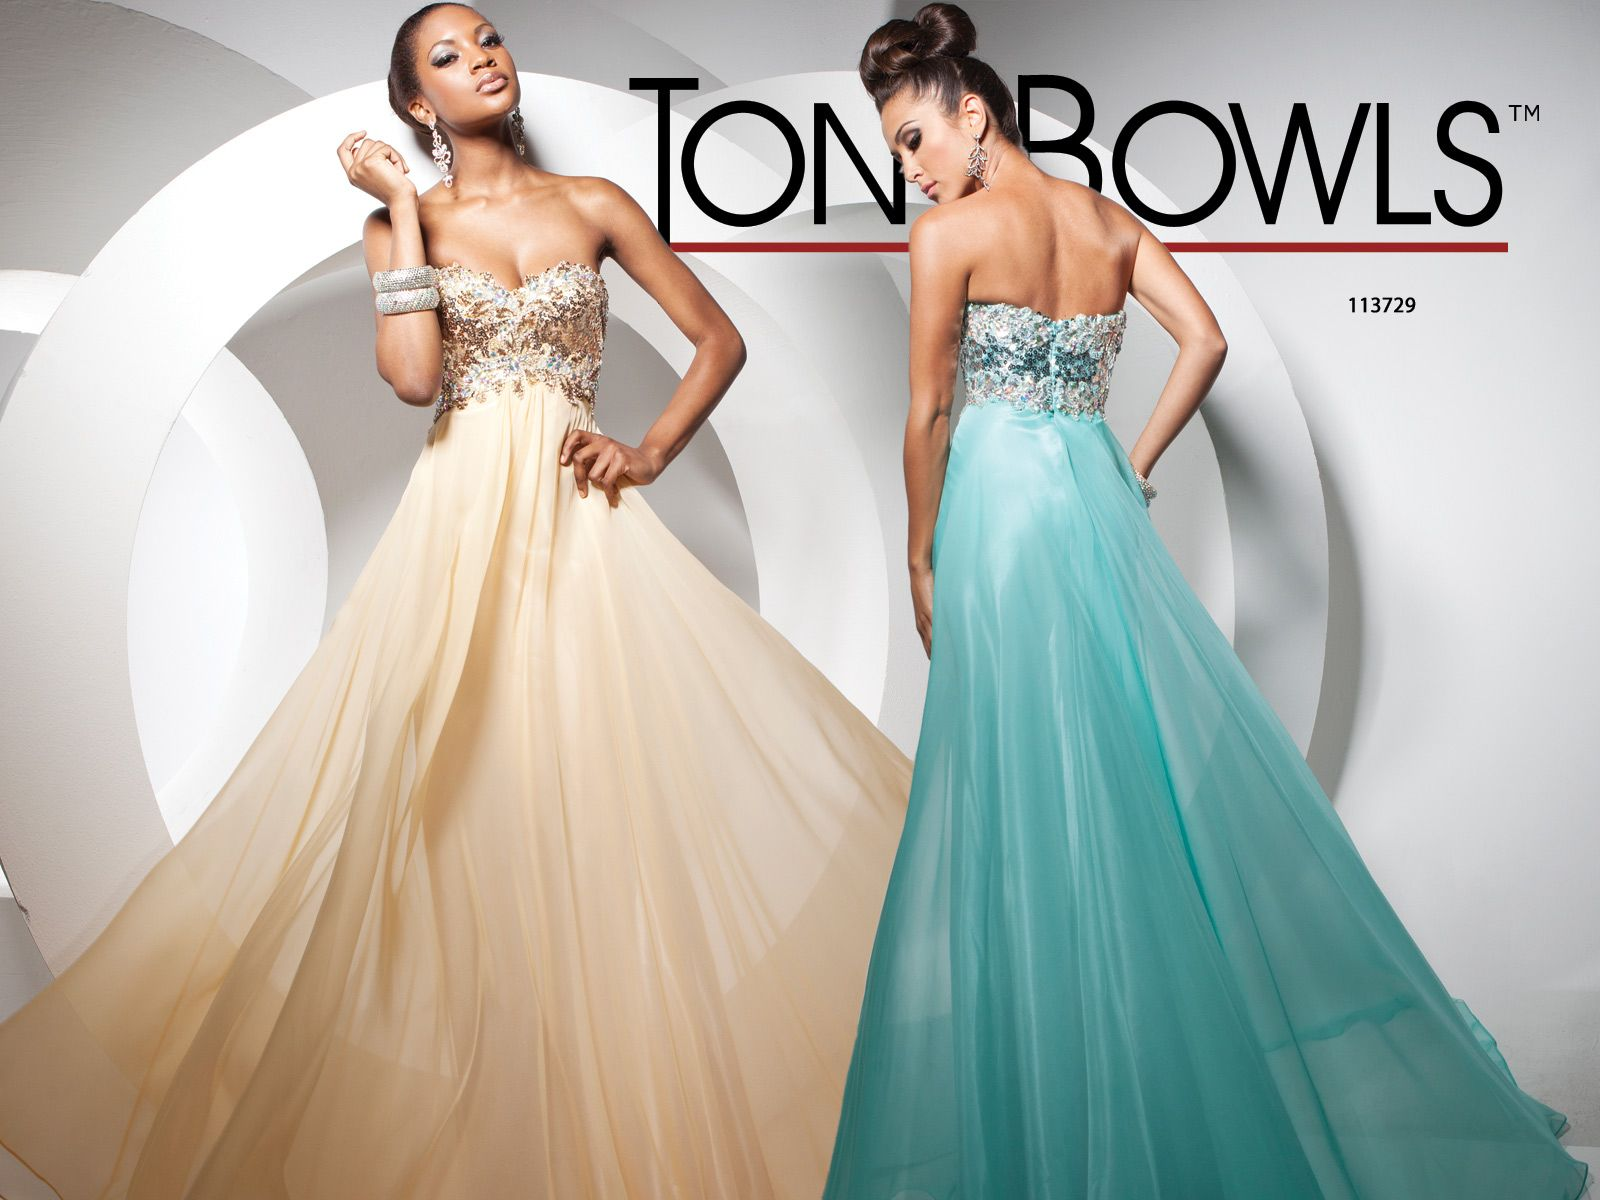 Wedding dresses lakeland fl  Tony Bowls Prom available at Albert Griffin Bridal Lakeland